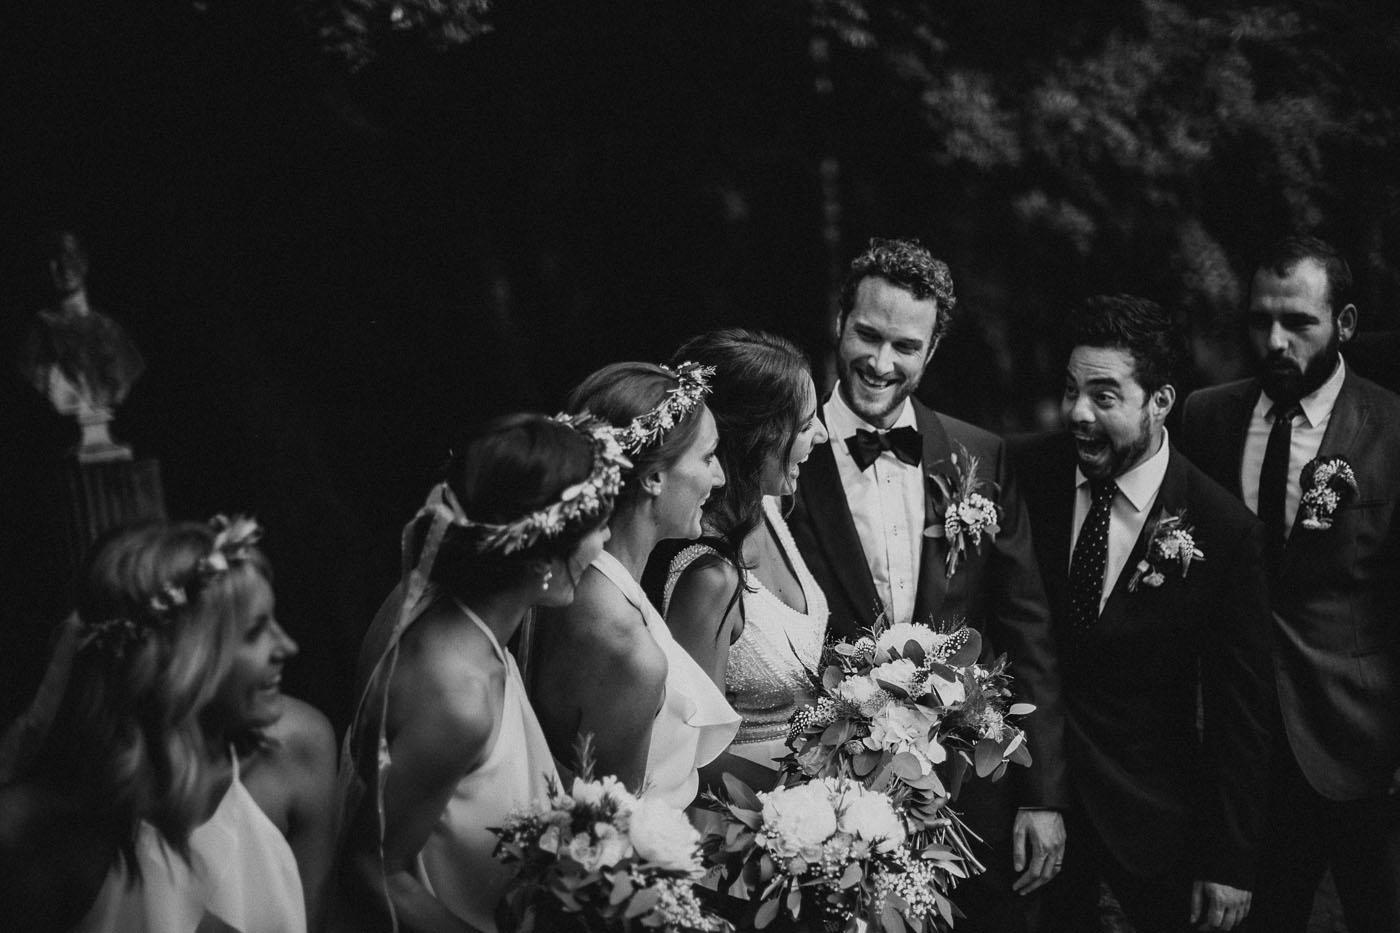 wedding-leopoldskron-photographer-28